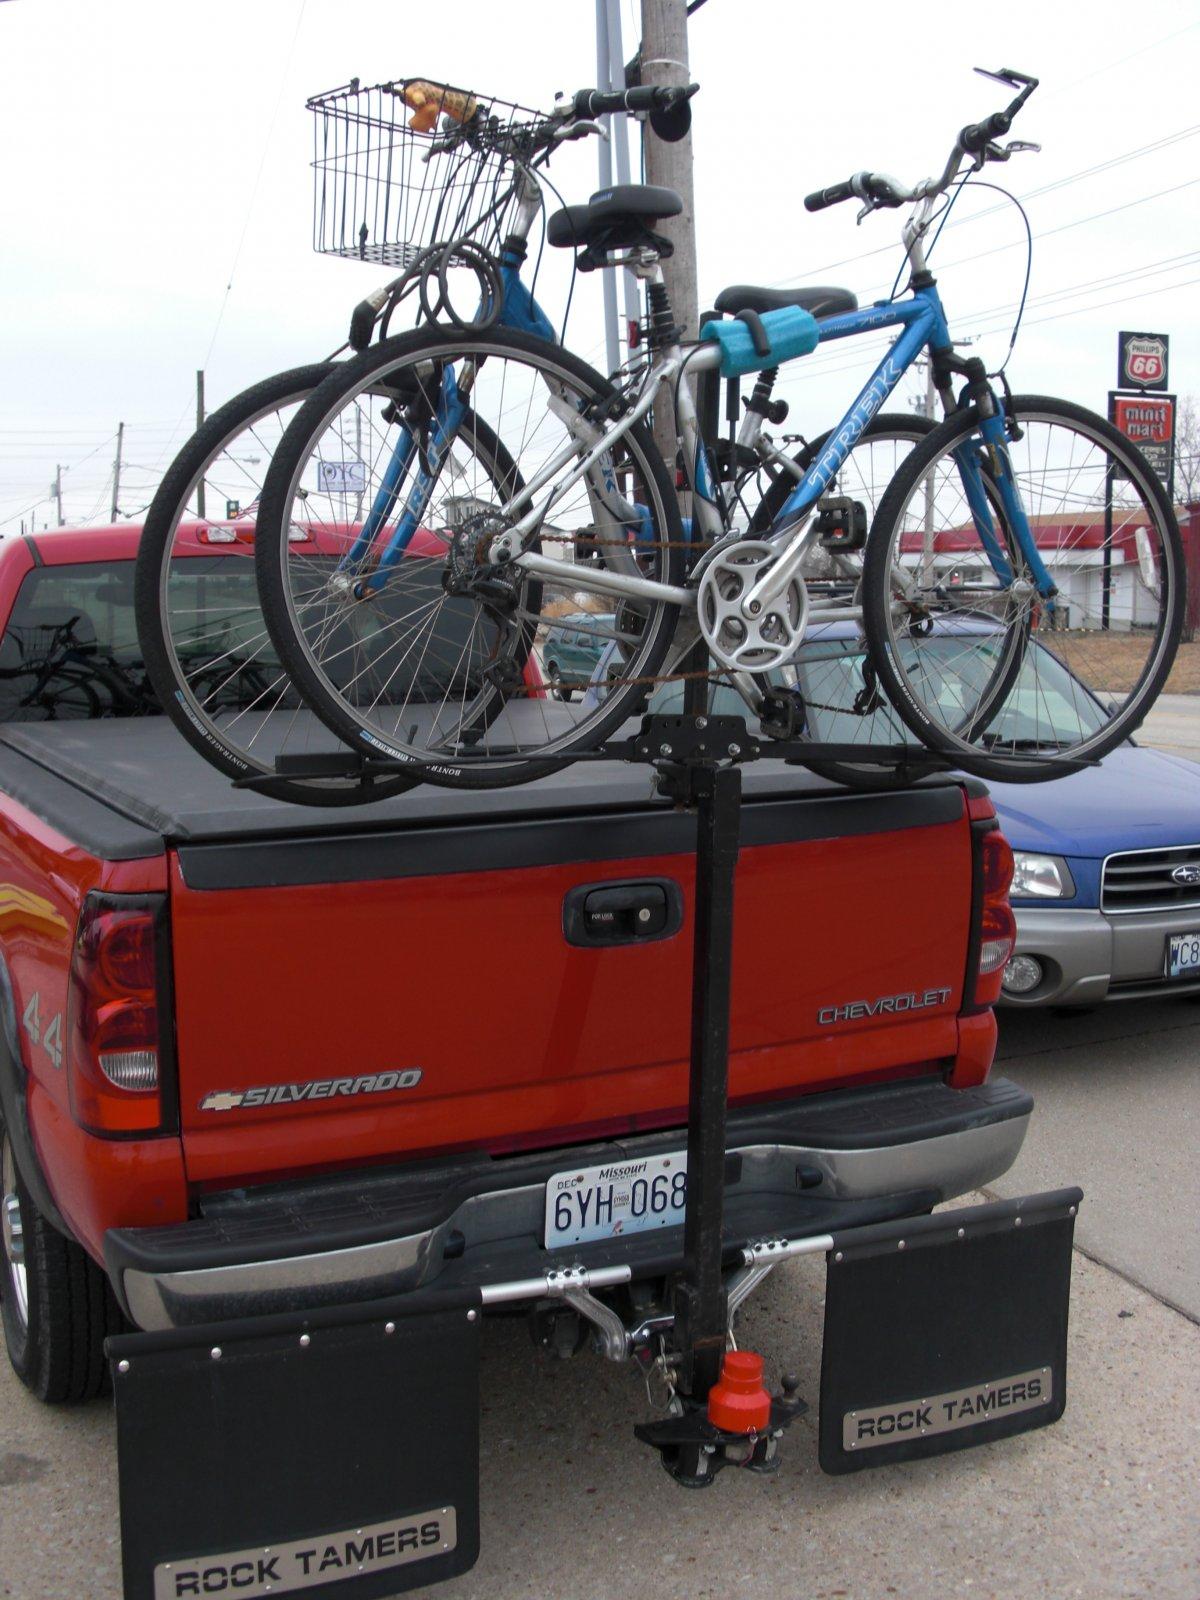 Click image for larger version  Name:Bike Rack.jpg Views:49 Size:288.2 KB ID:97793